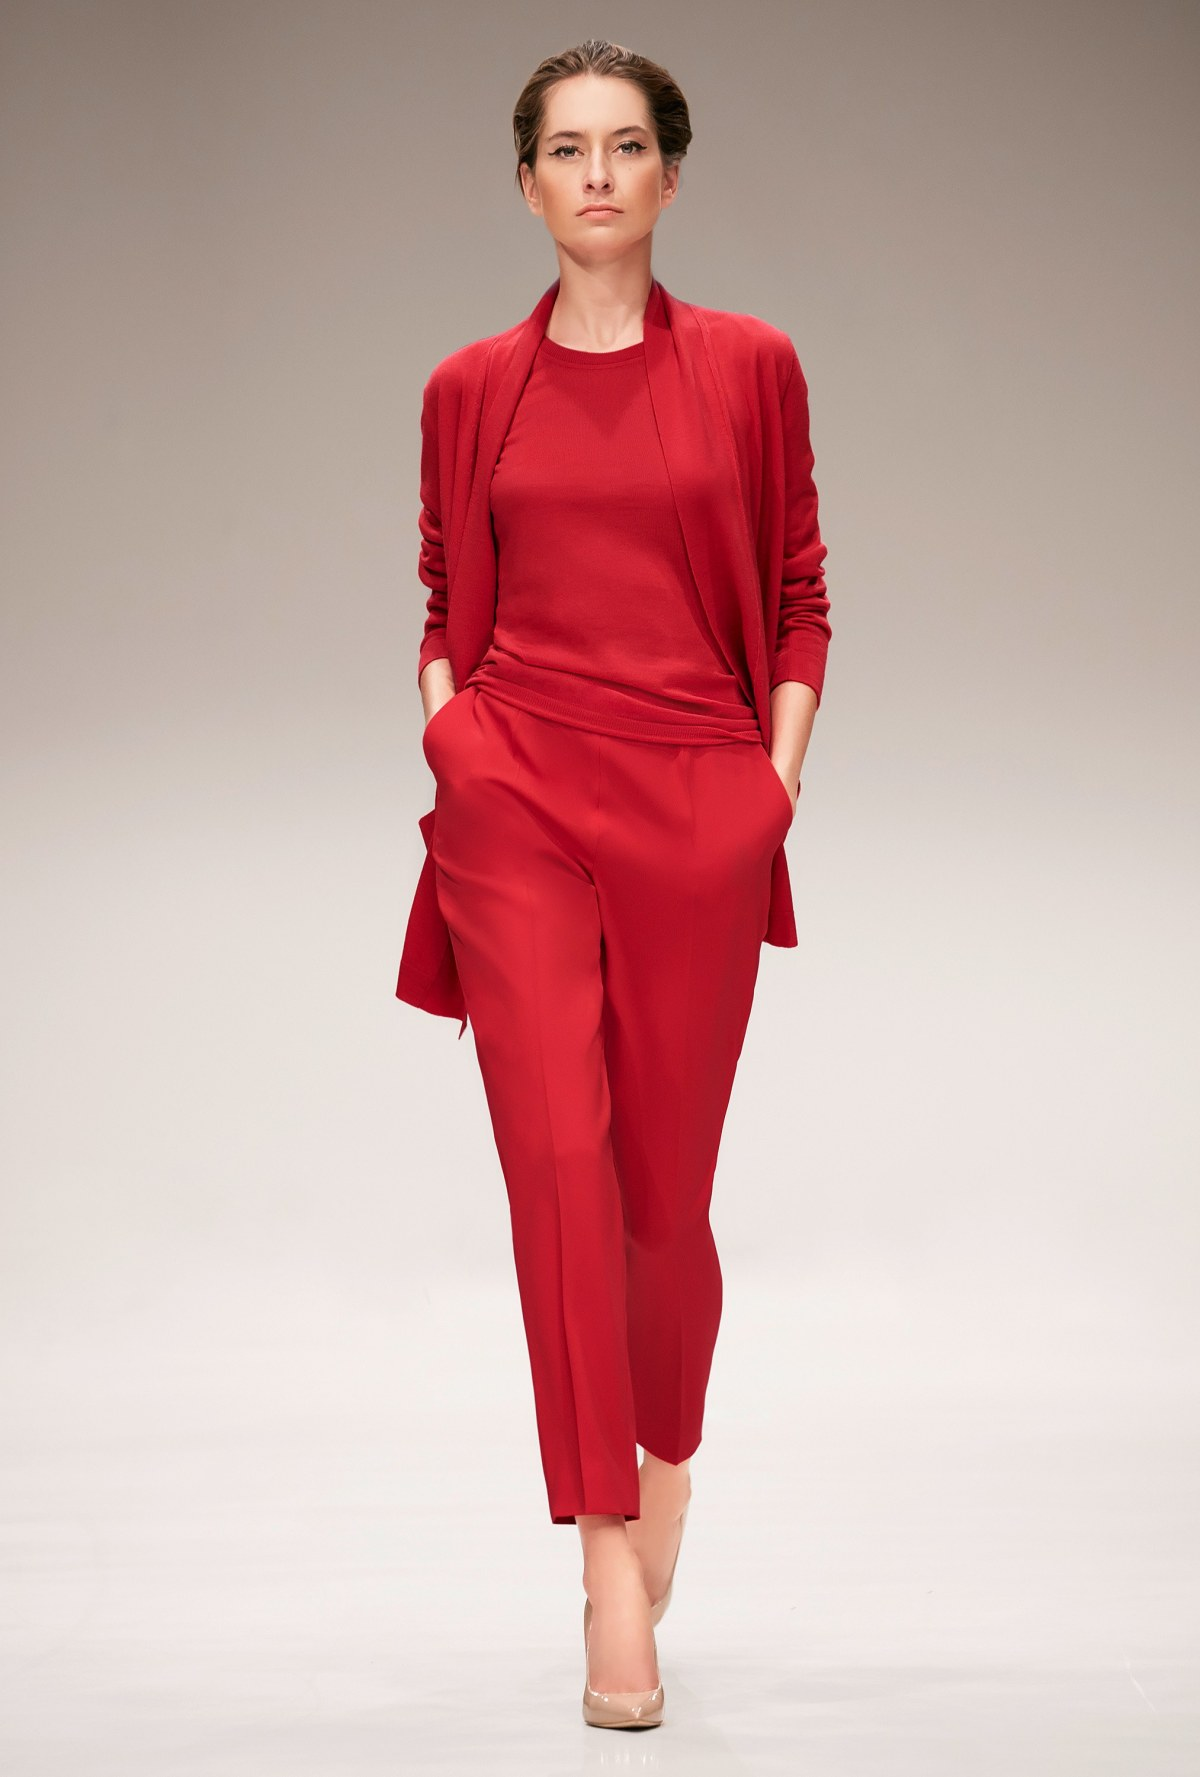 escada-pre-fall-2017-fashion-show-the-impression-05